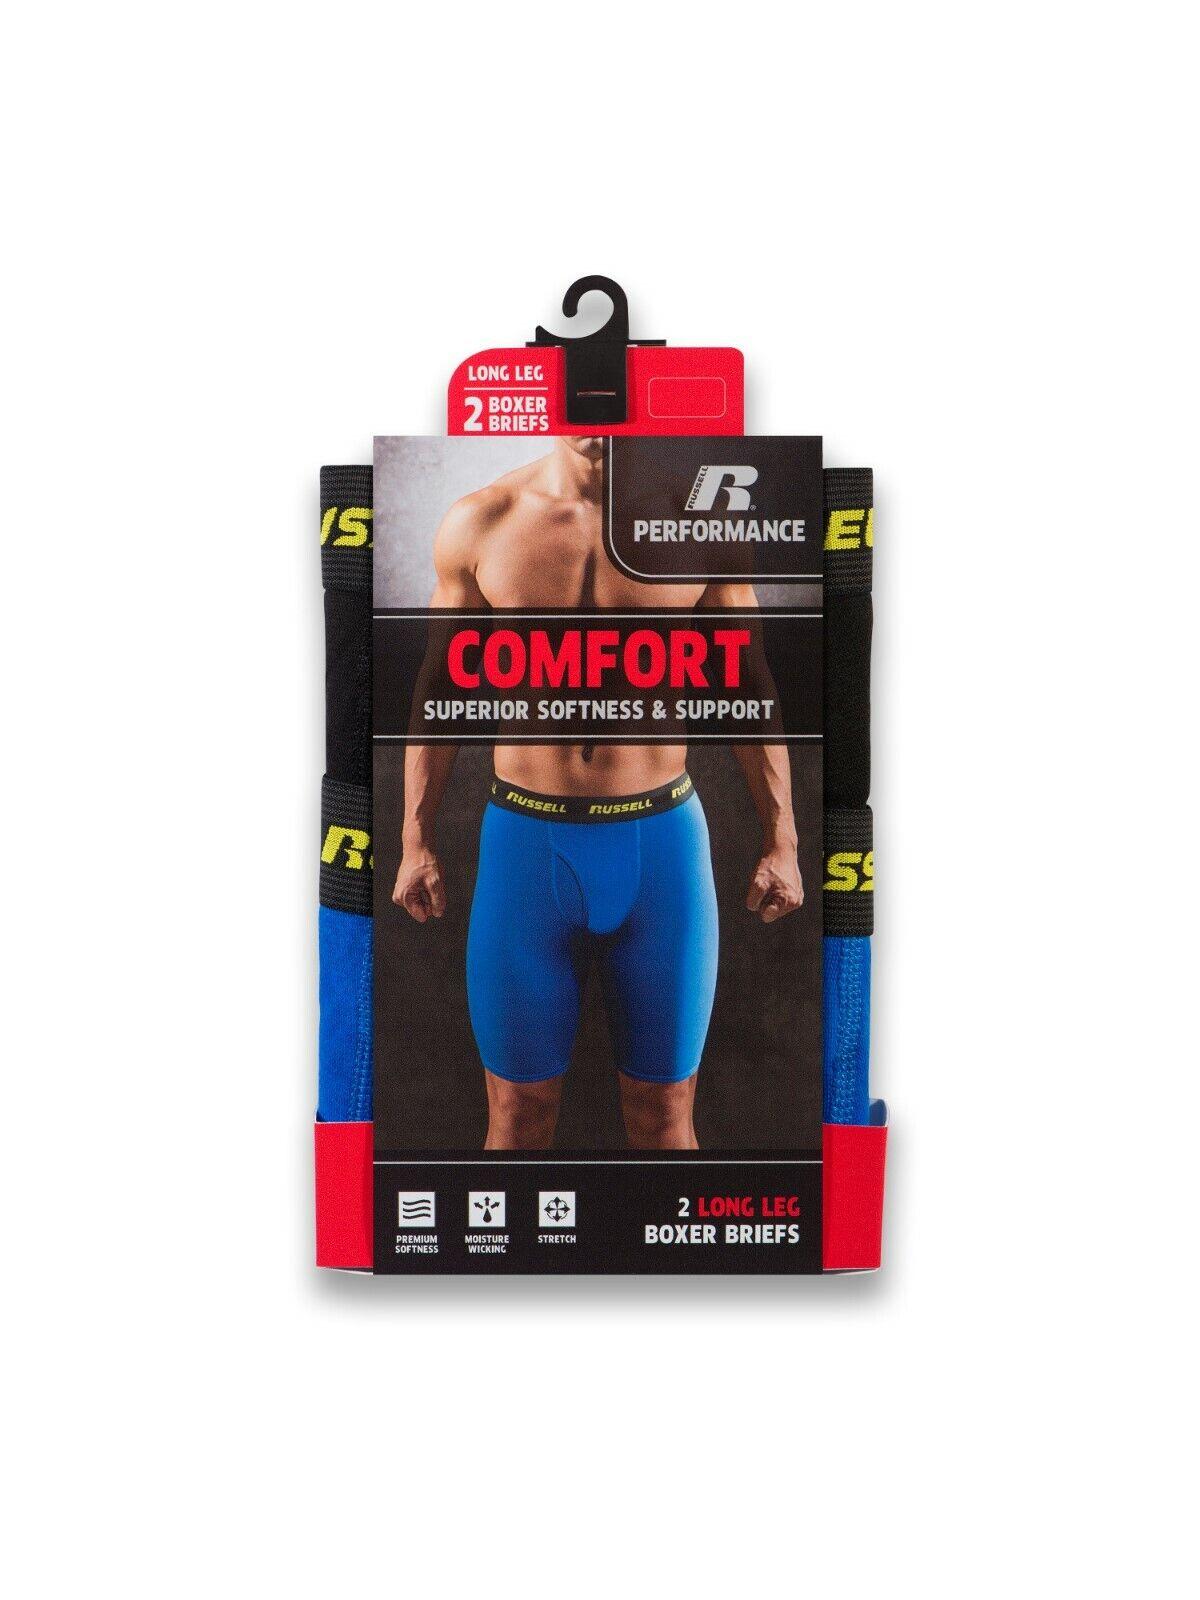 performance long leg boxer briefs 2 pack